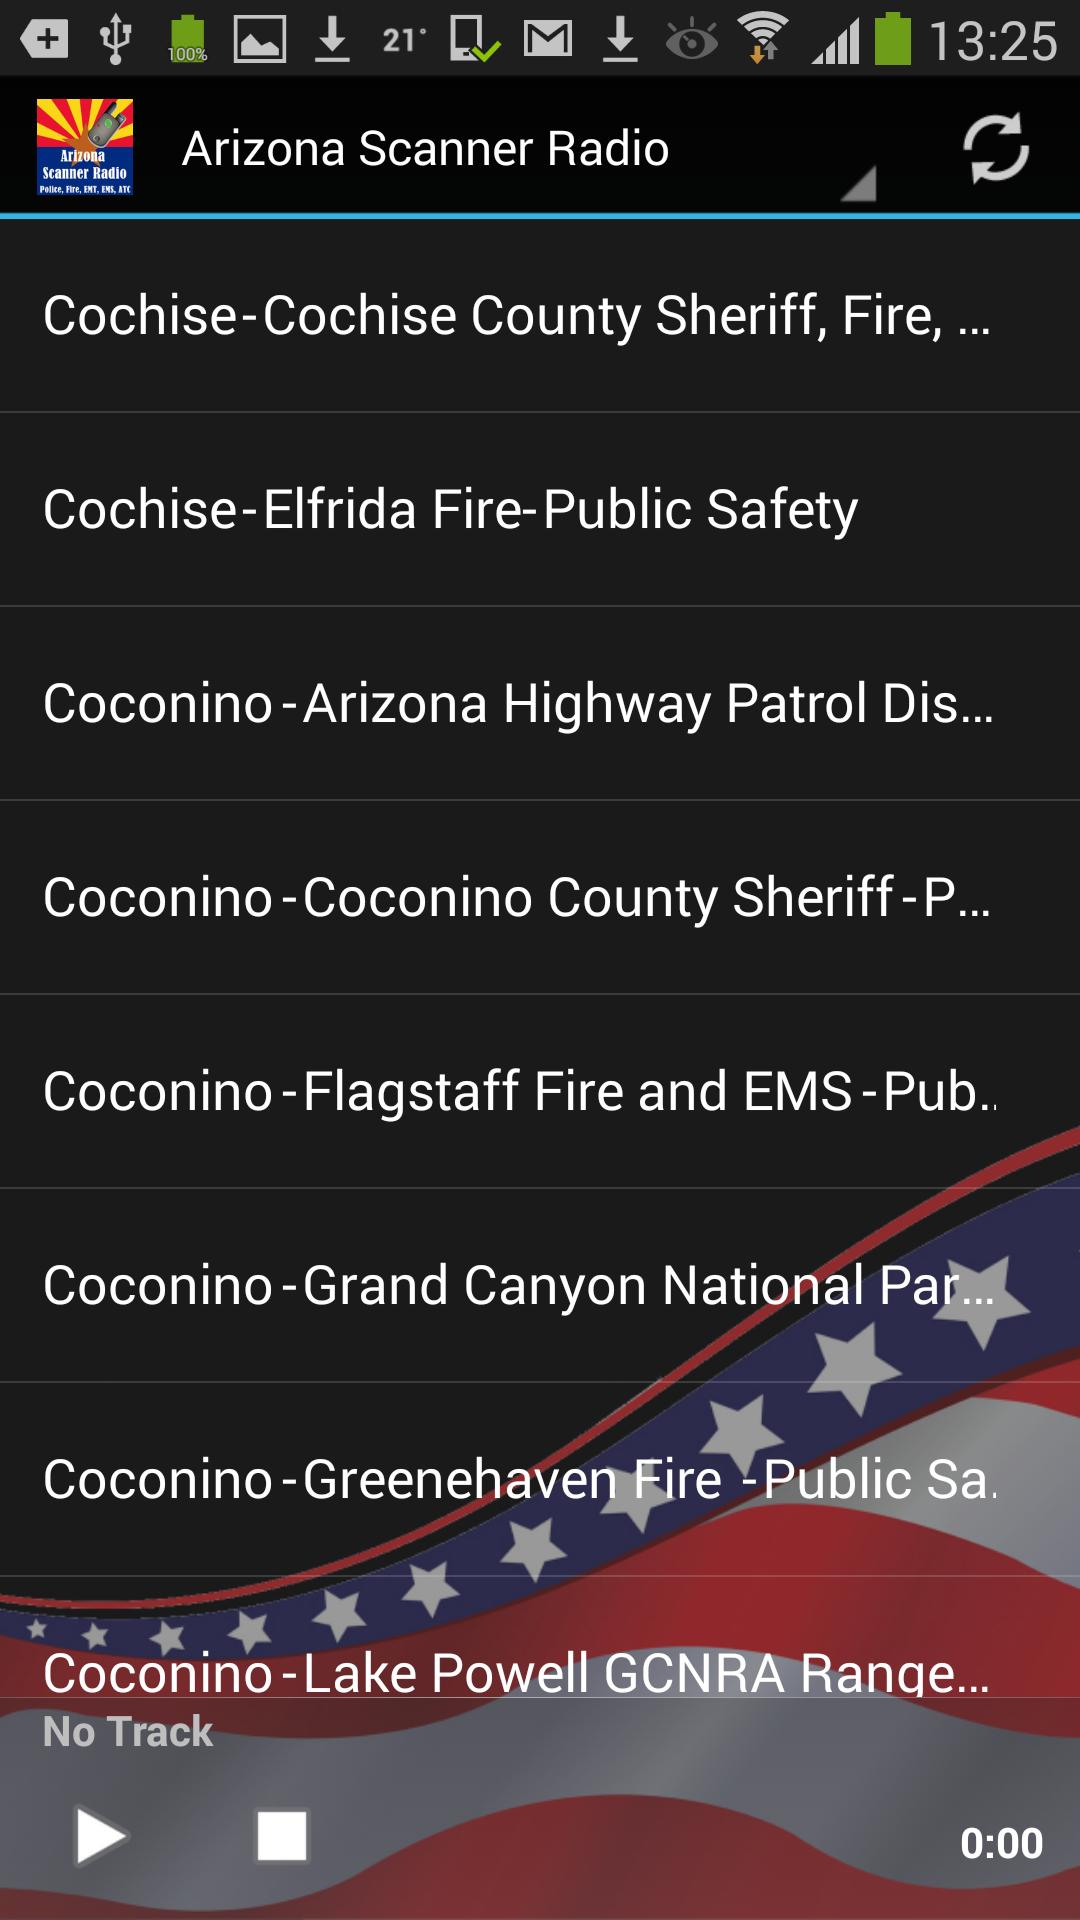 Arizona Scanner Radio - Police, Fire, EMS, EMT, ATC